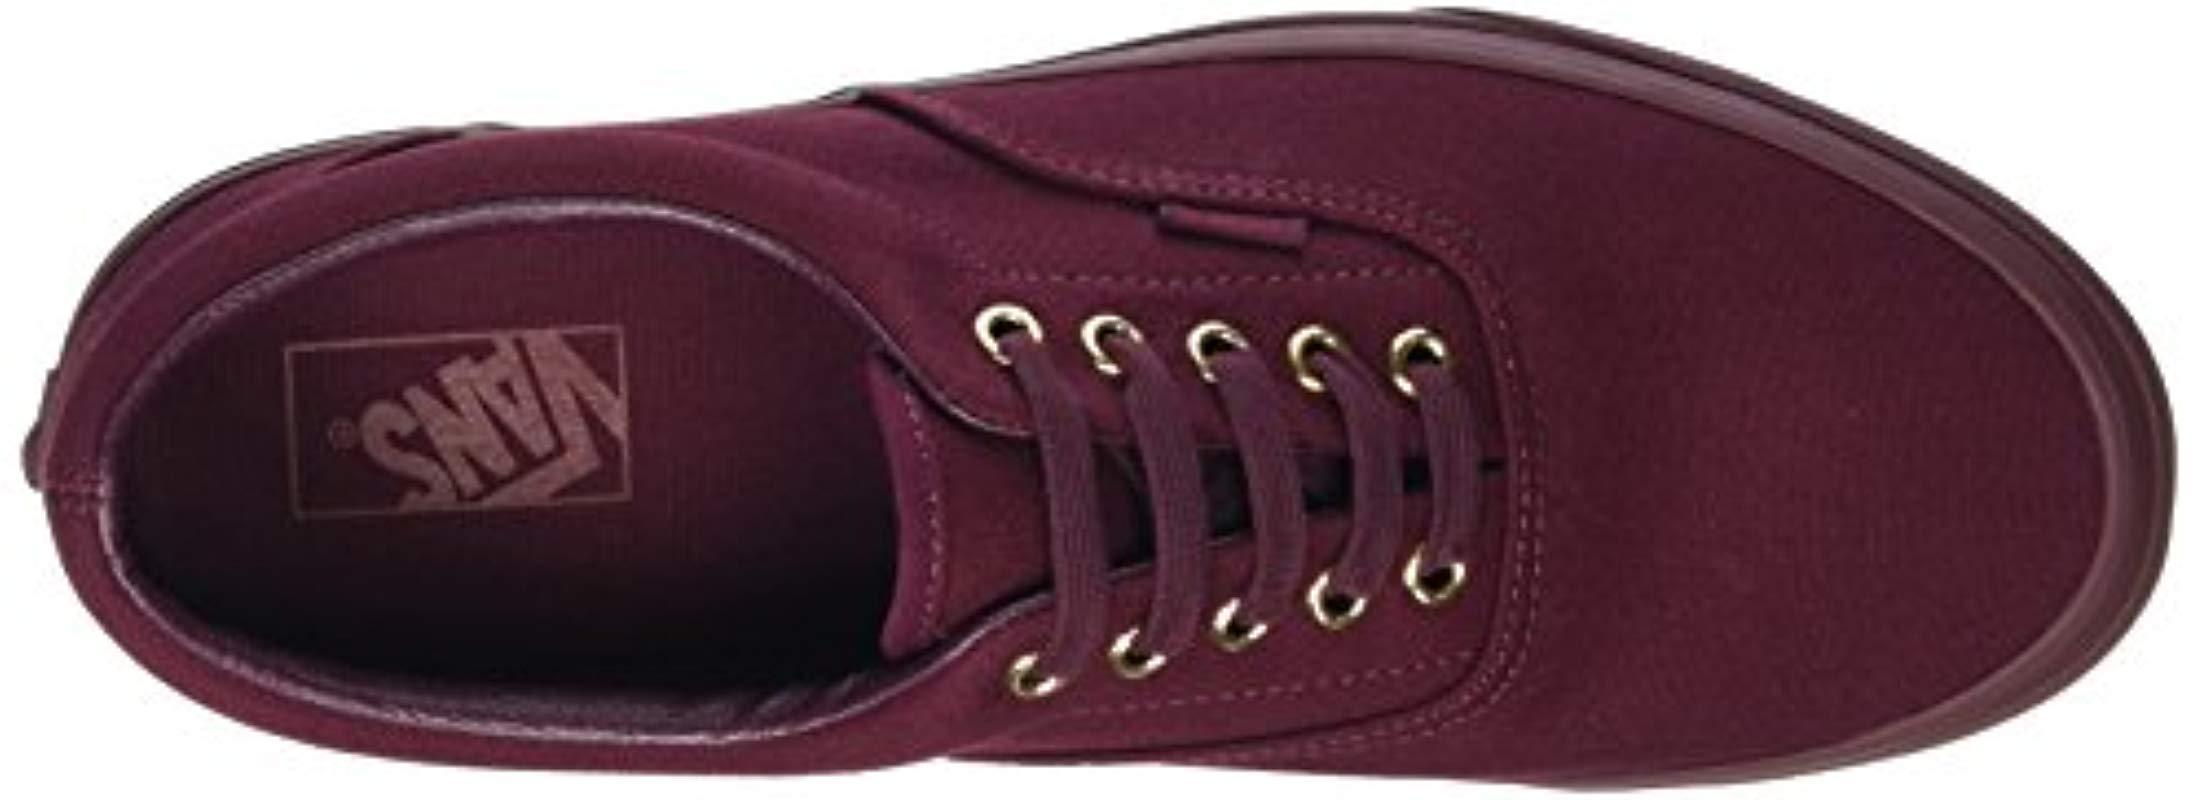 8abf375009c957 Lyst - Vans Unisex Era Skate Shoes